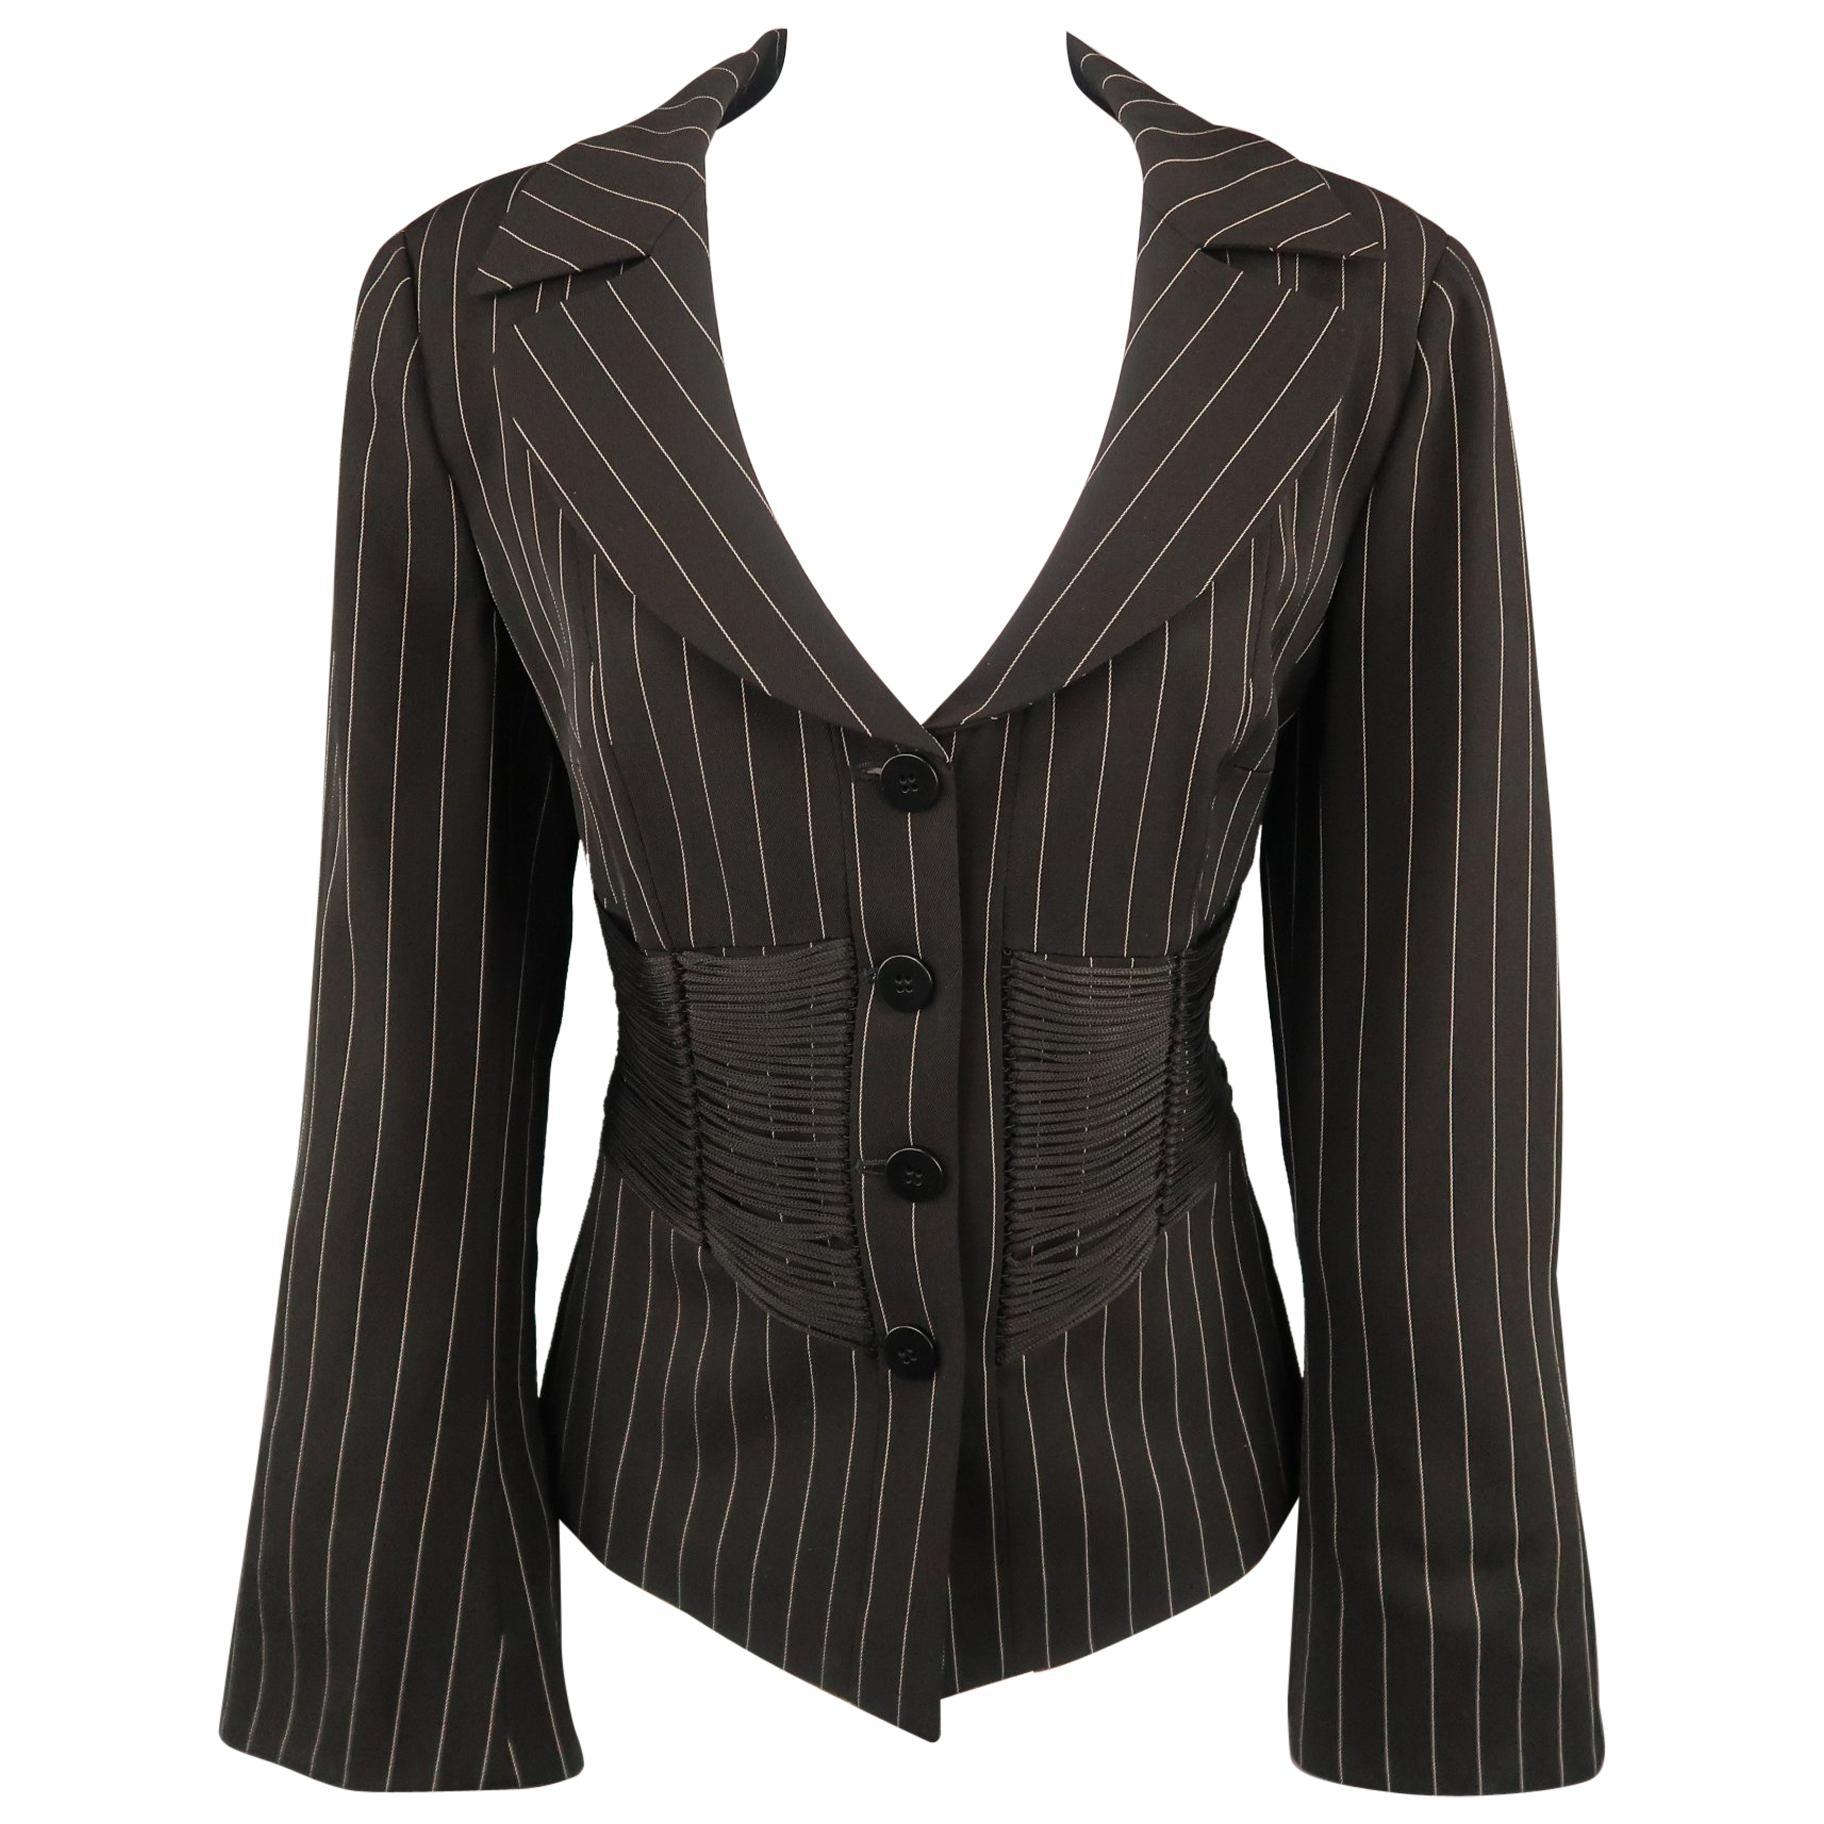 ARMANI COLLEZIONI Size 12 Black Pinstripe Fringe Corset Blazer Jacket